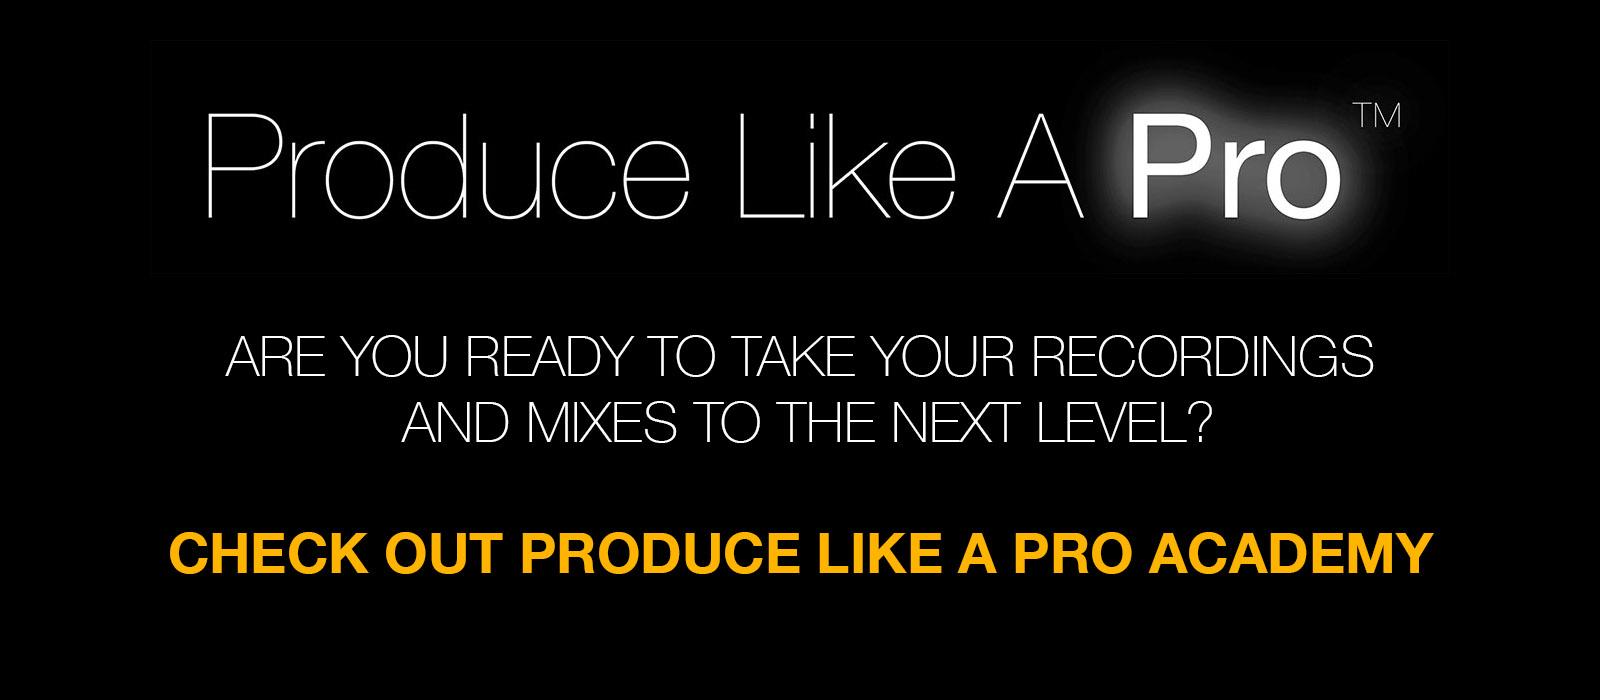 Produce like a pro